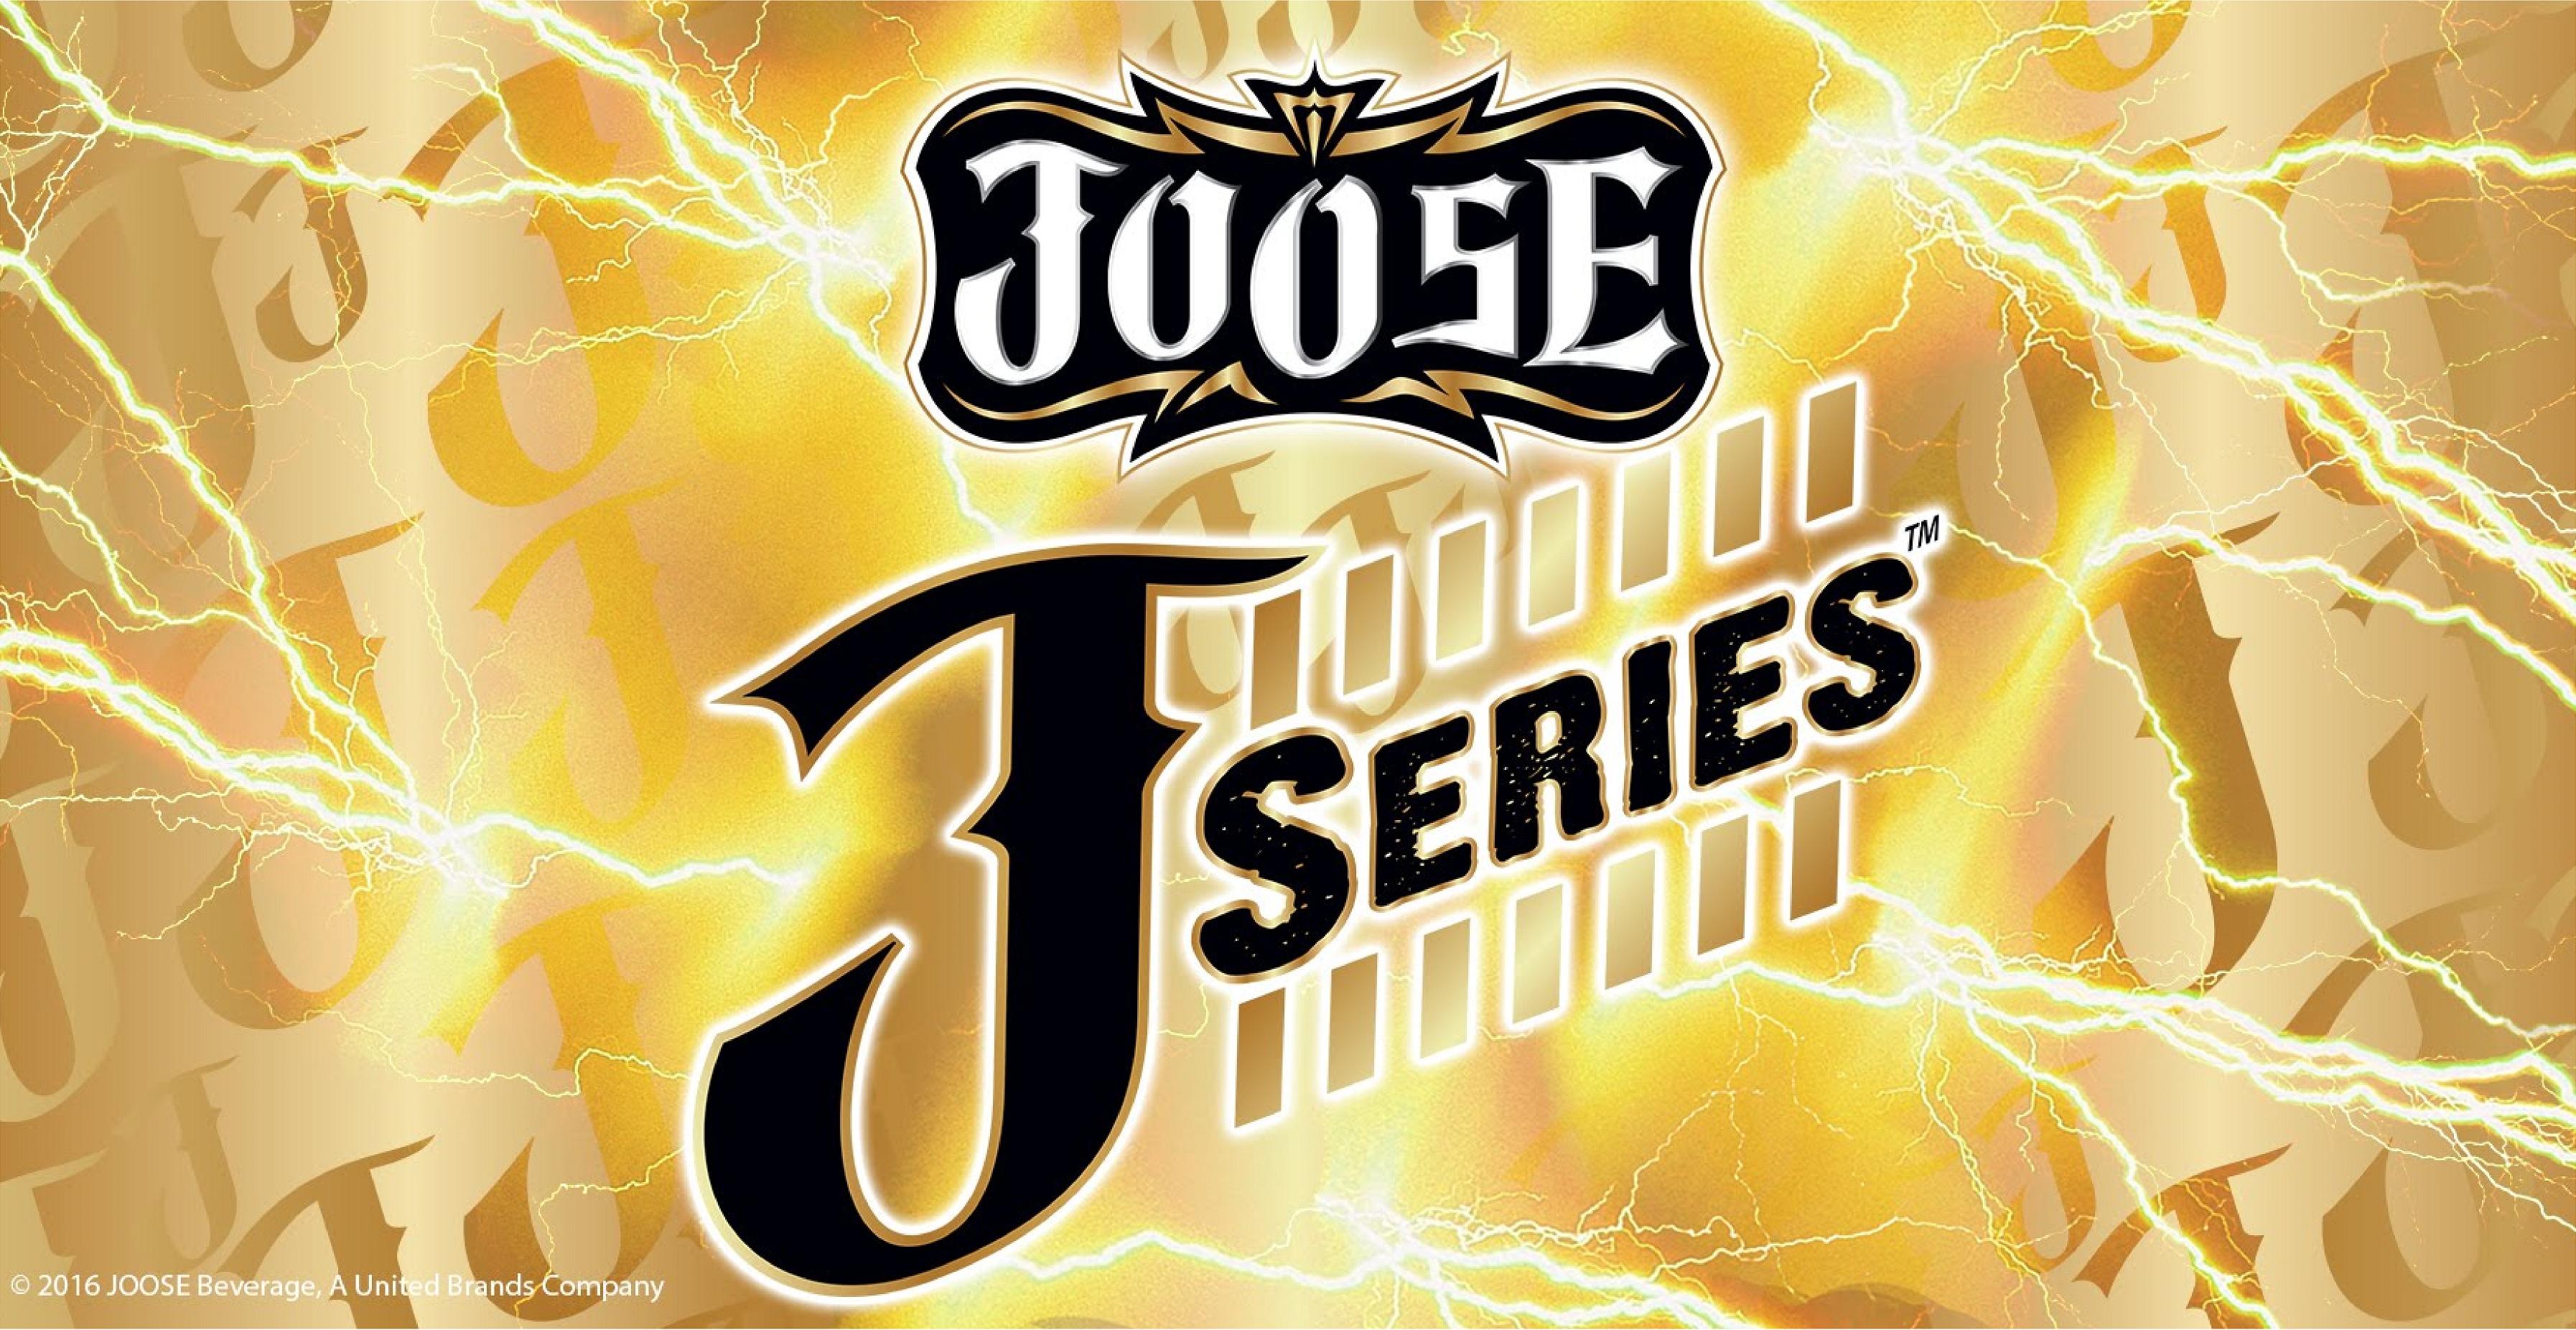 Joose J-series